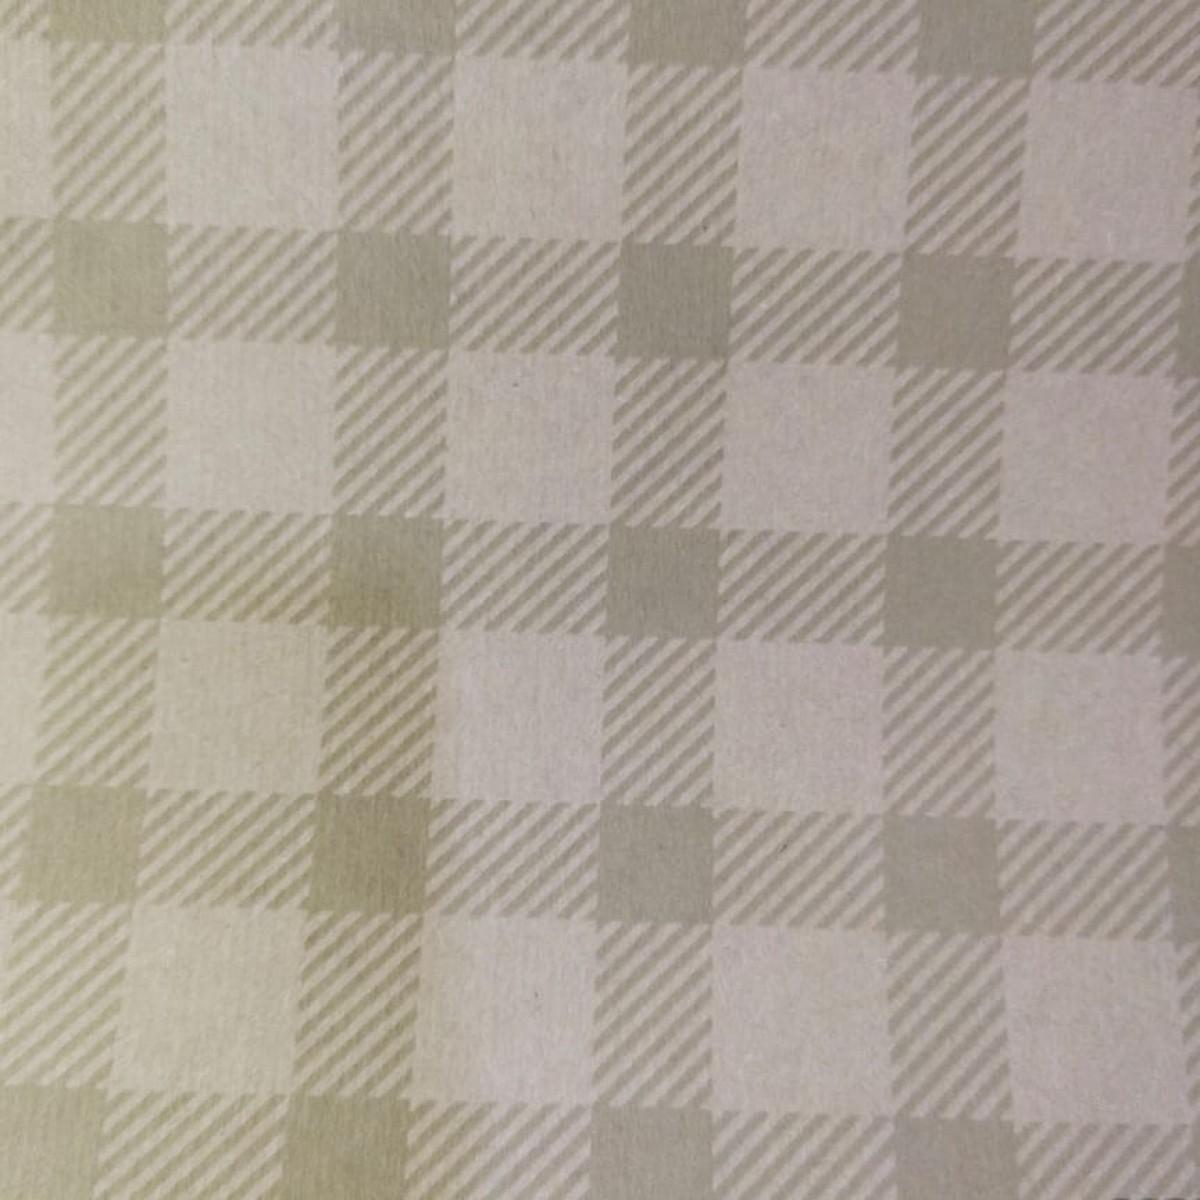 7204 Chex Print Gold 50cmx25m Kraft Paper - 1 Roll